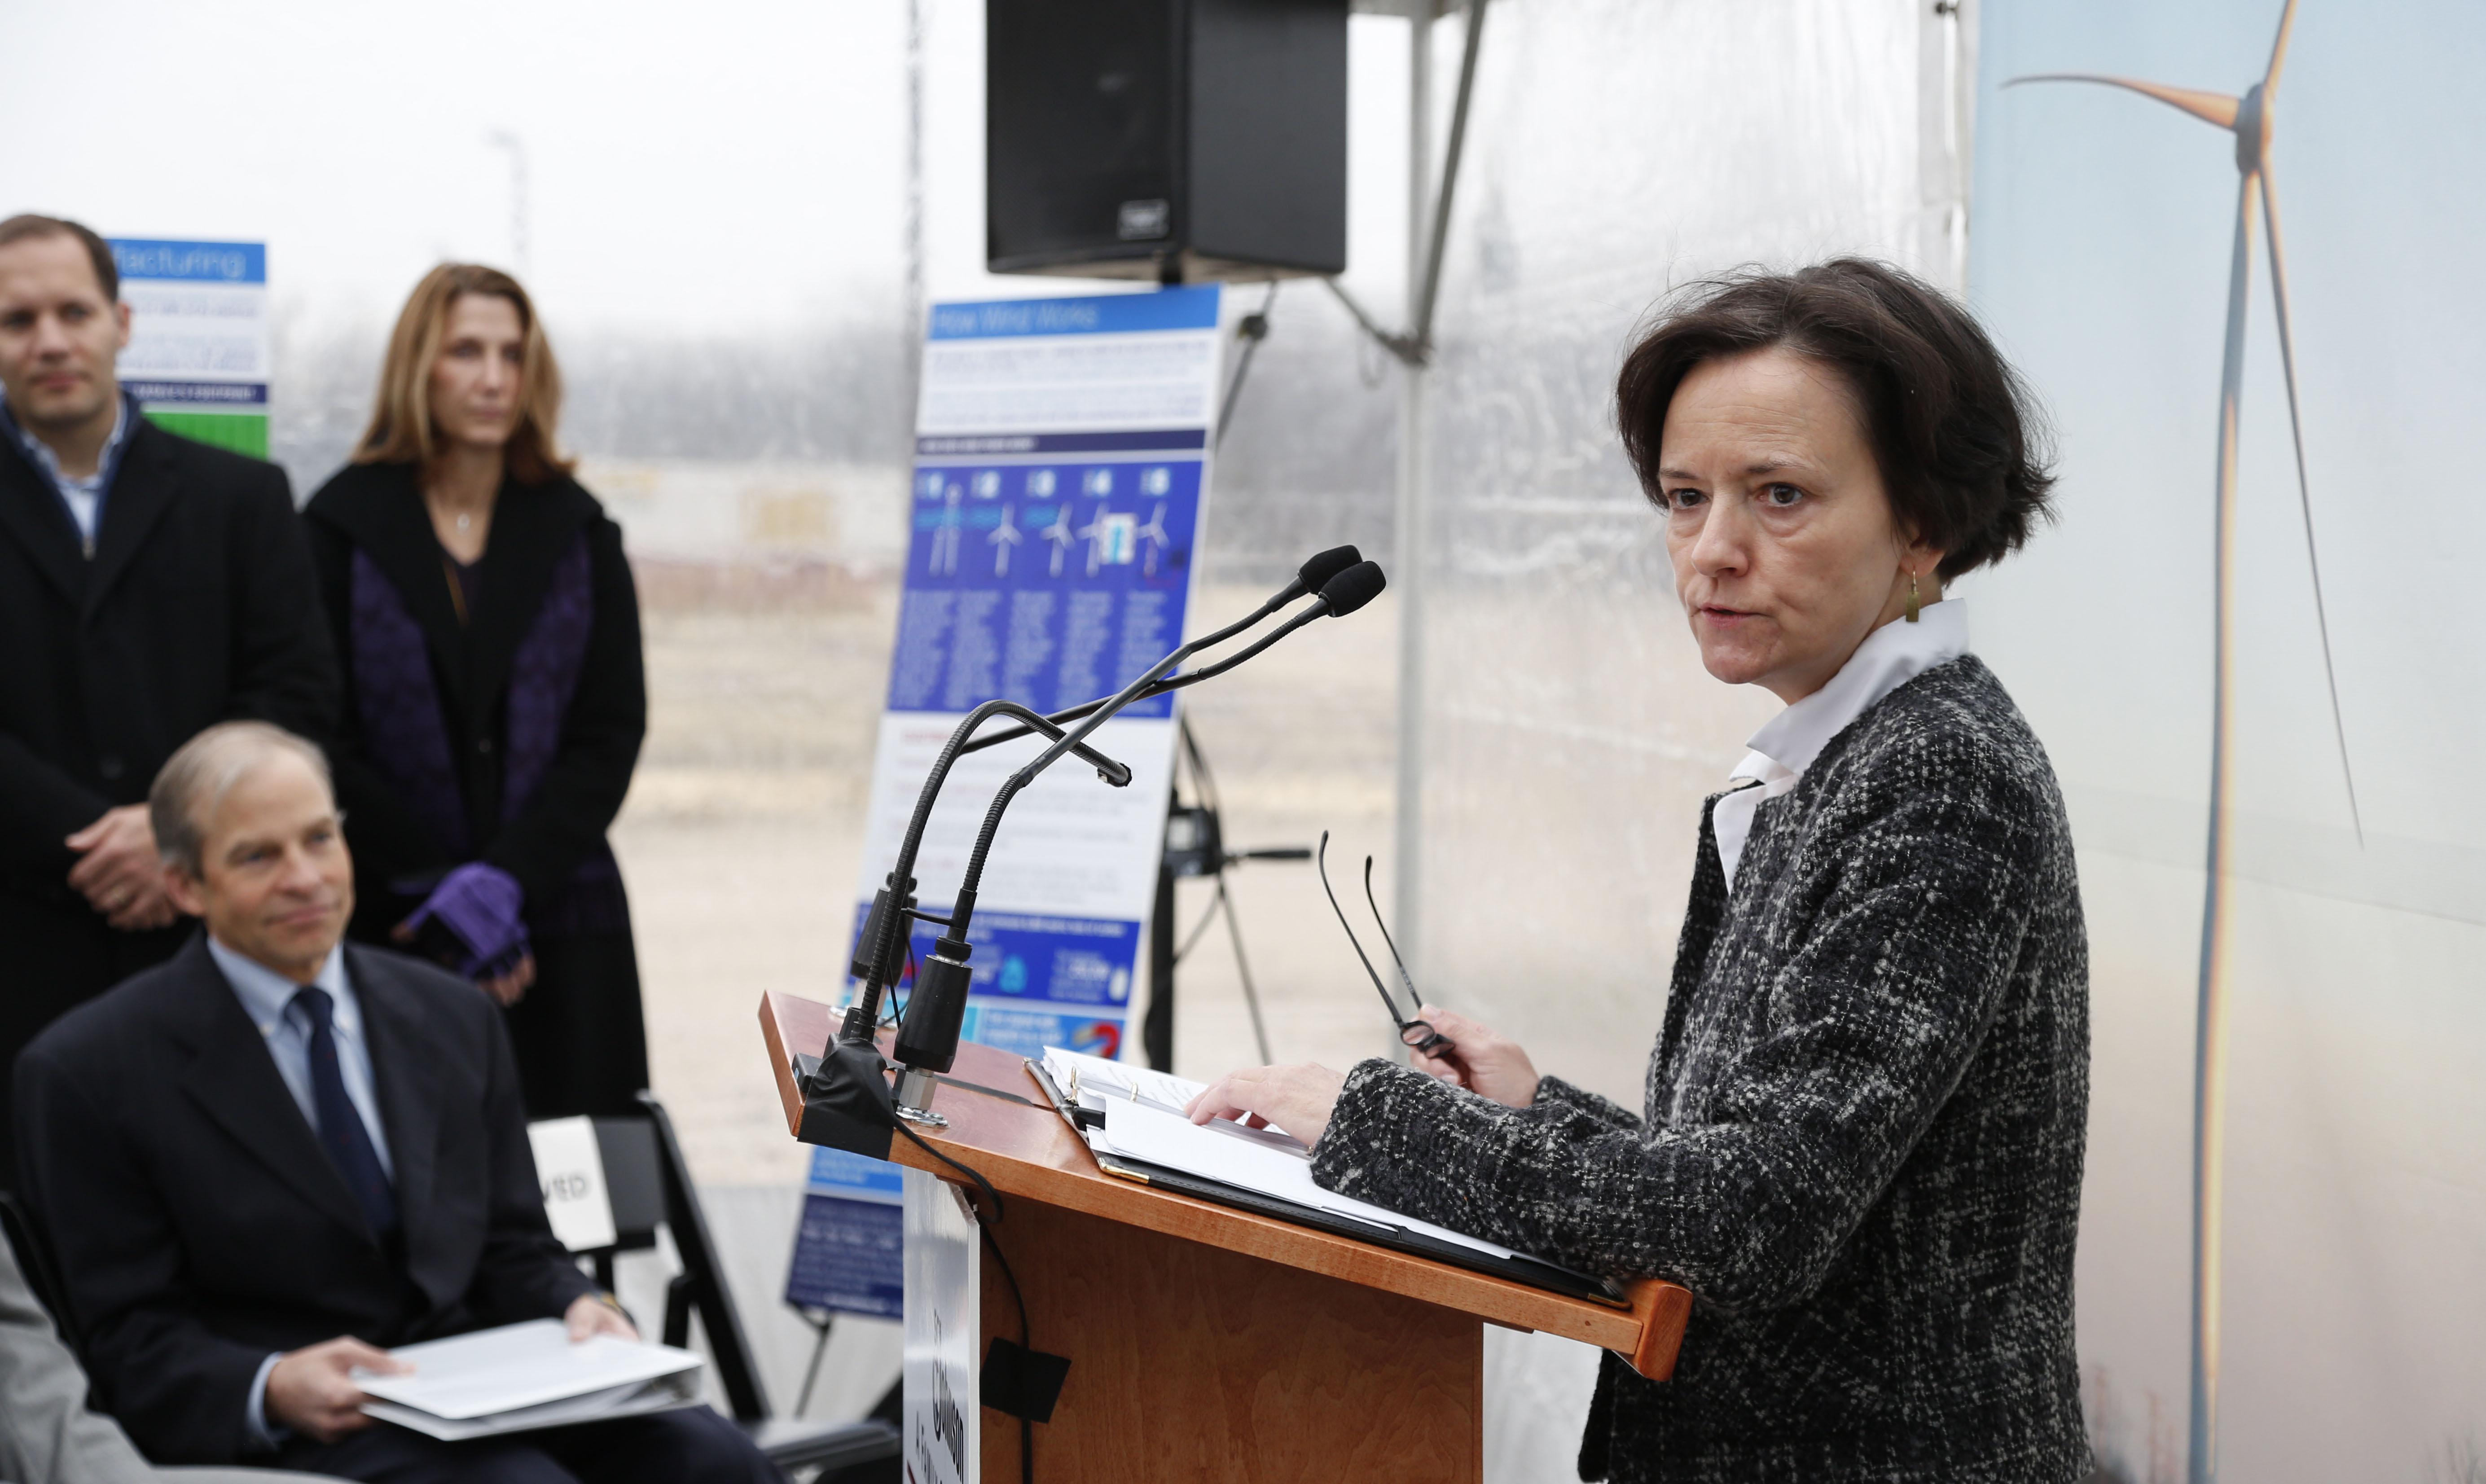 Dr. Susan Hedman, U.S. EPA region 5 Administrator, in Mt. Pleasant, Wis. on Dec. 18, 2012.